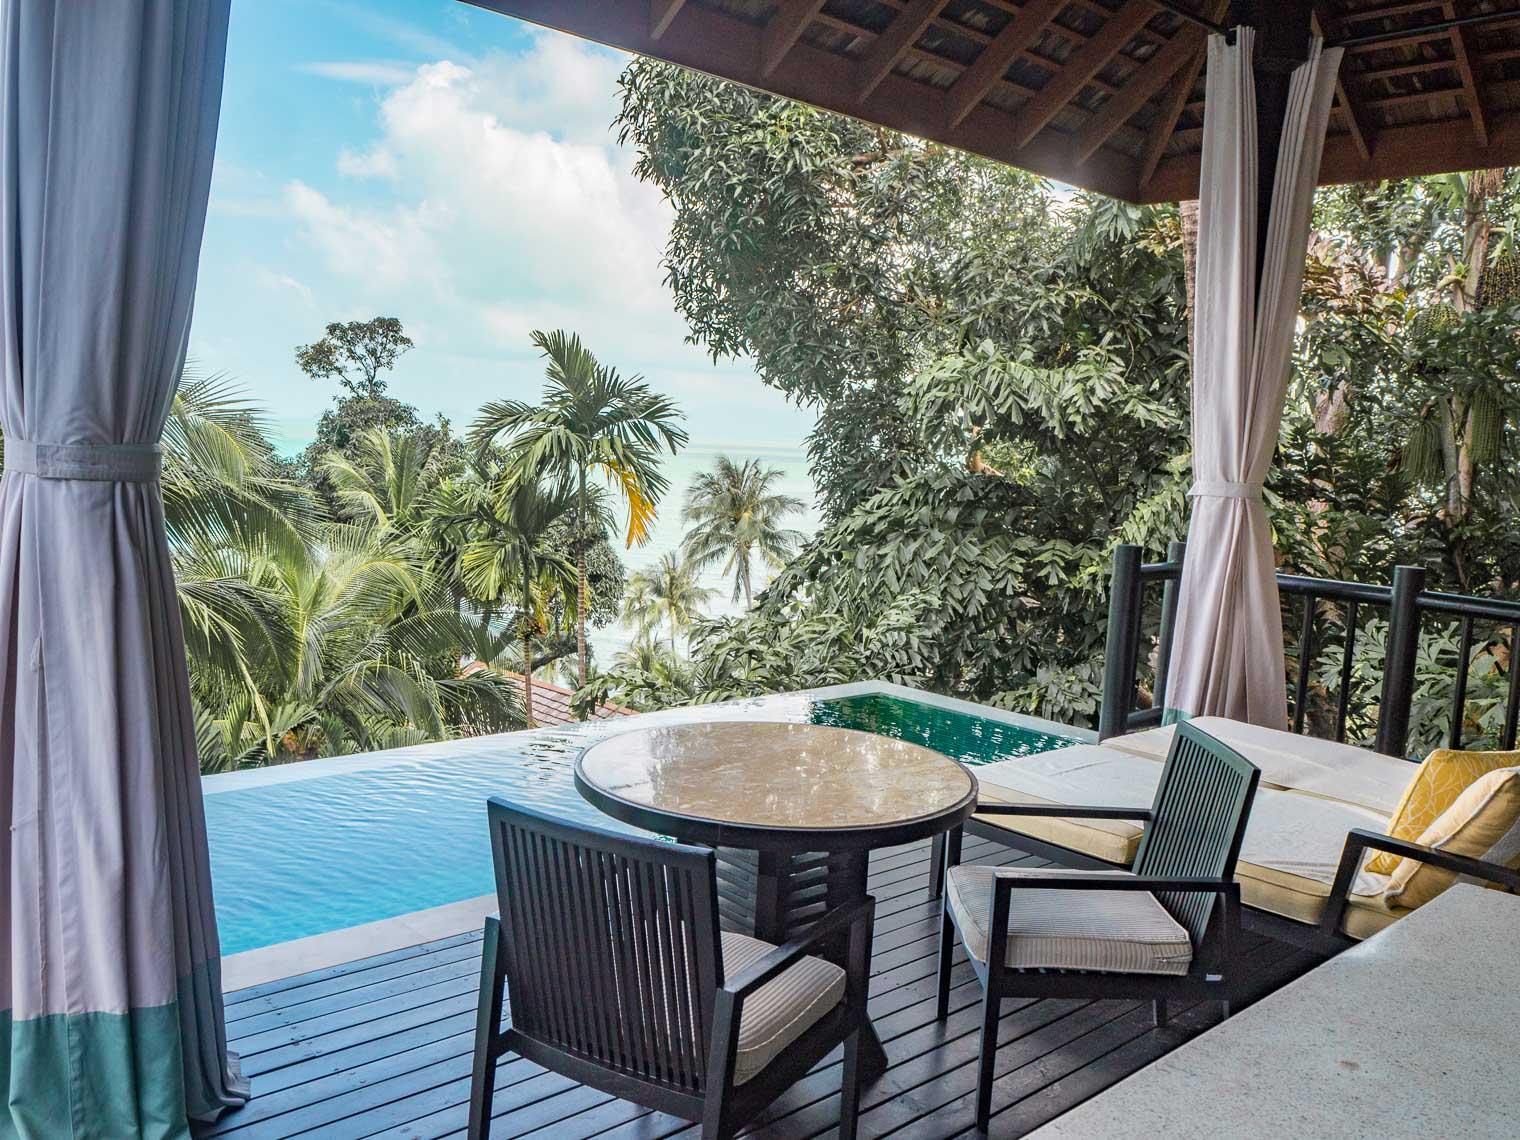 Terrace at Four Seasons Koh Samui private villa